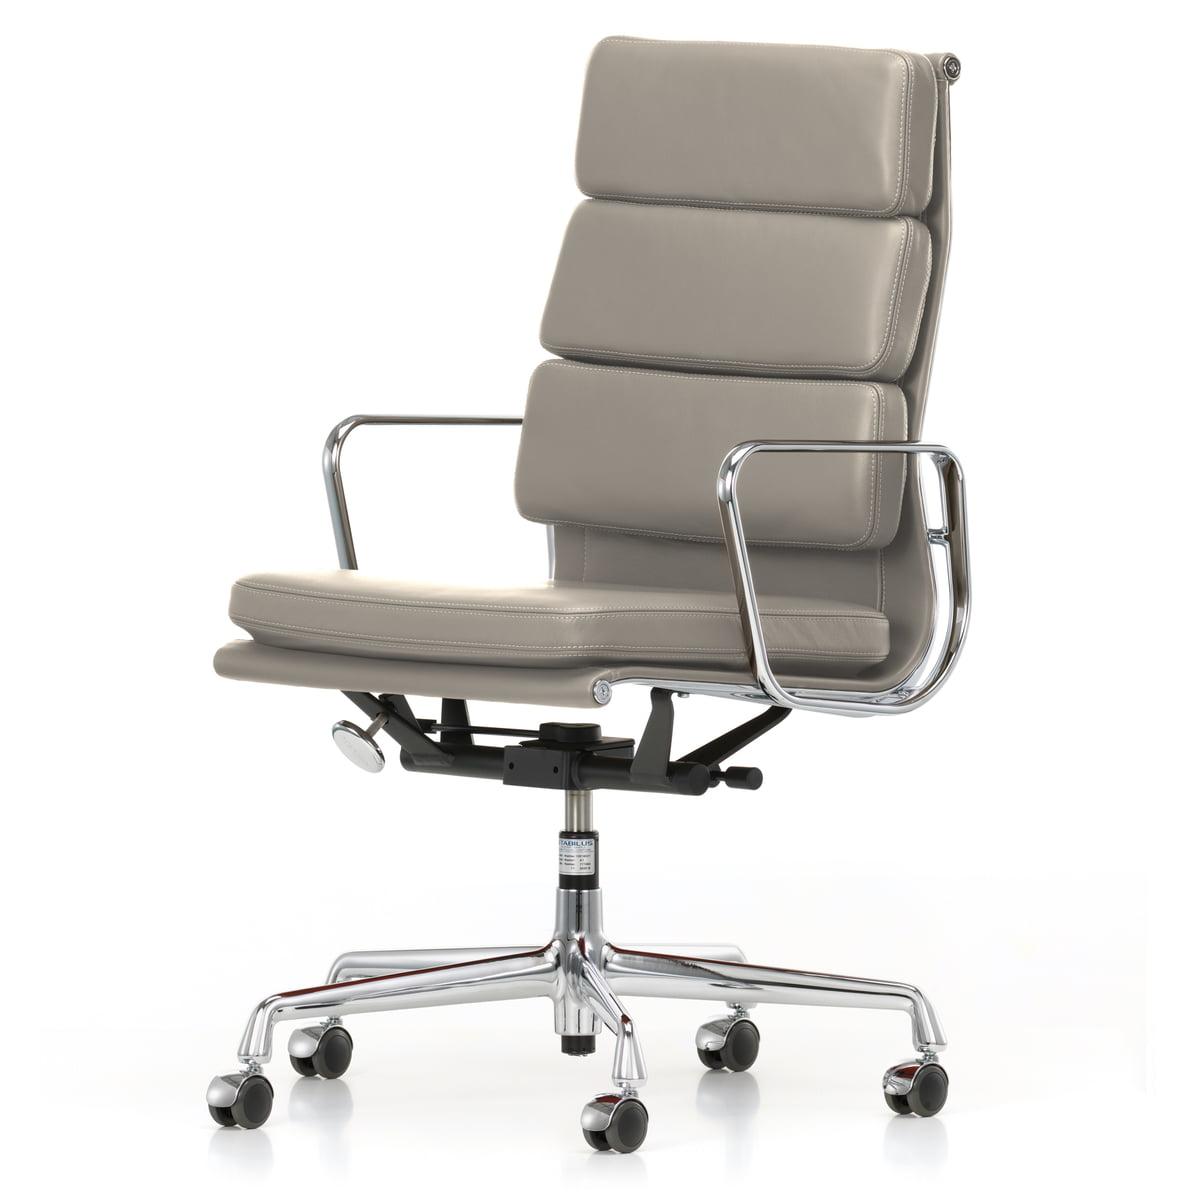 Vitra - EA 219 Soft Pad Bürostuhl Chrom mit Armlehnen, Leder Premium ton (Hartbodenrollen)   Büro > Bürostühle und Sessel    Beige   Vitra